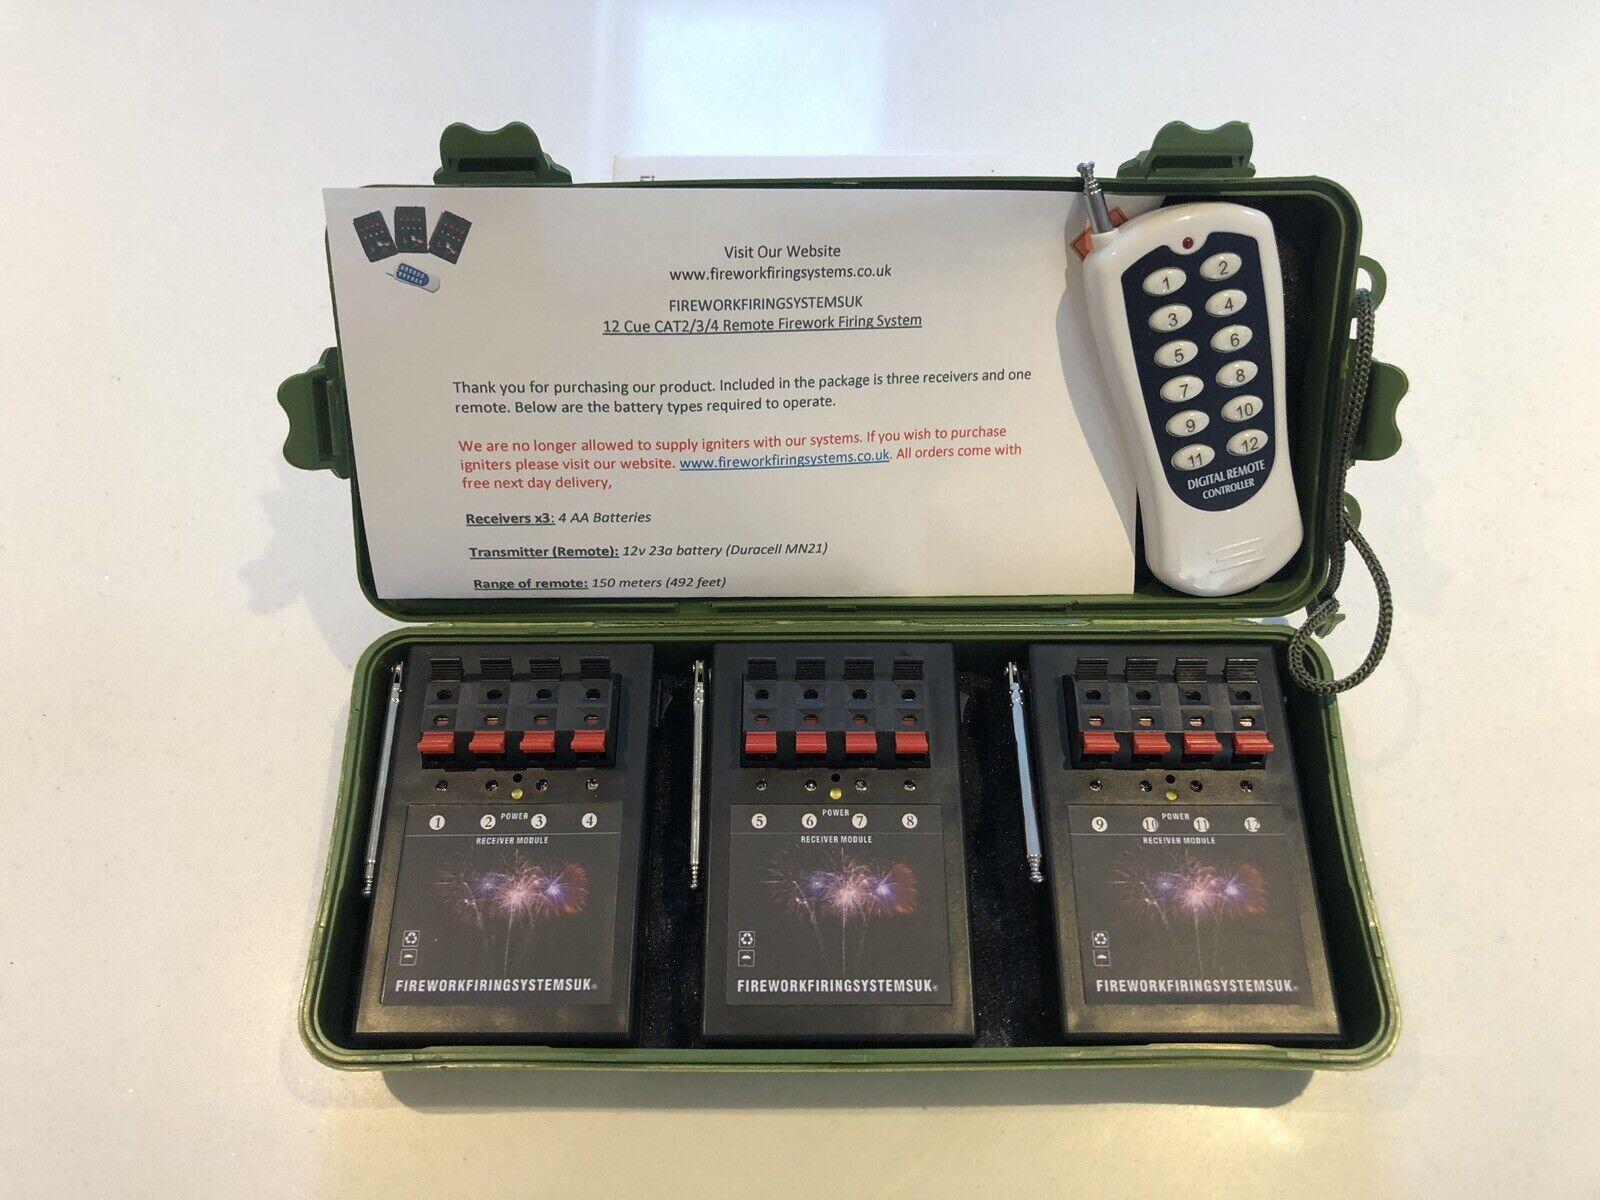 12 Cue Firework Firing System, Professional, Wireless, FREE 12x IGNITER